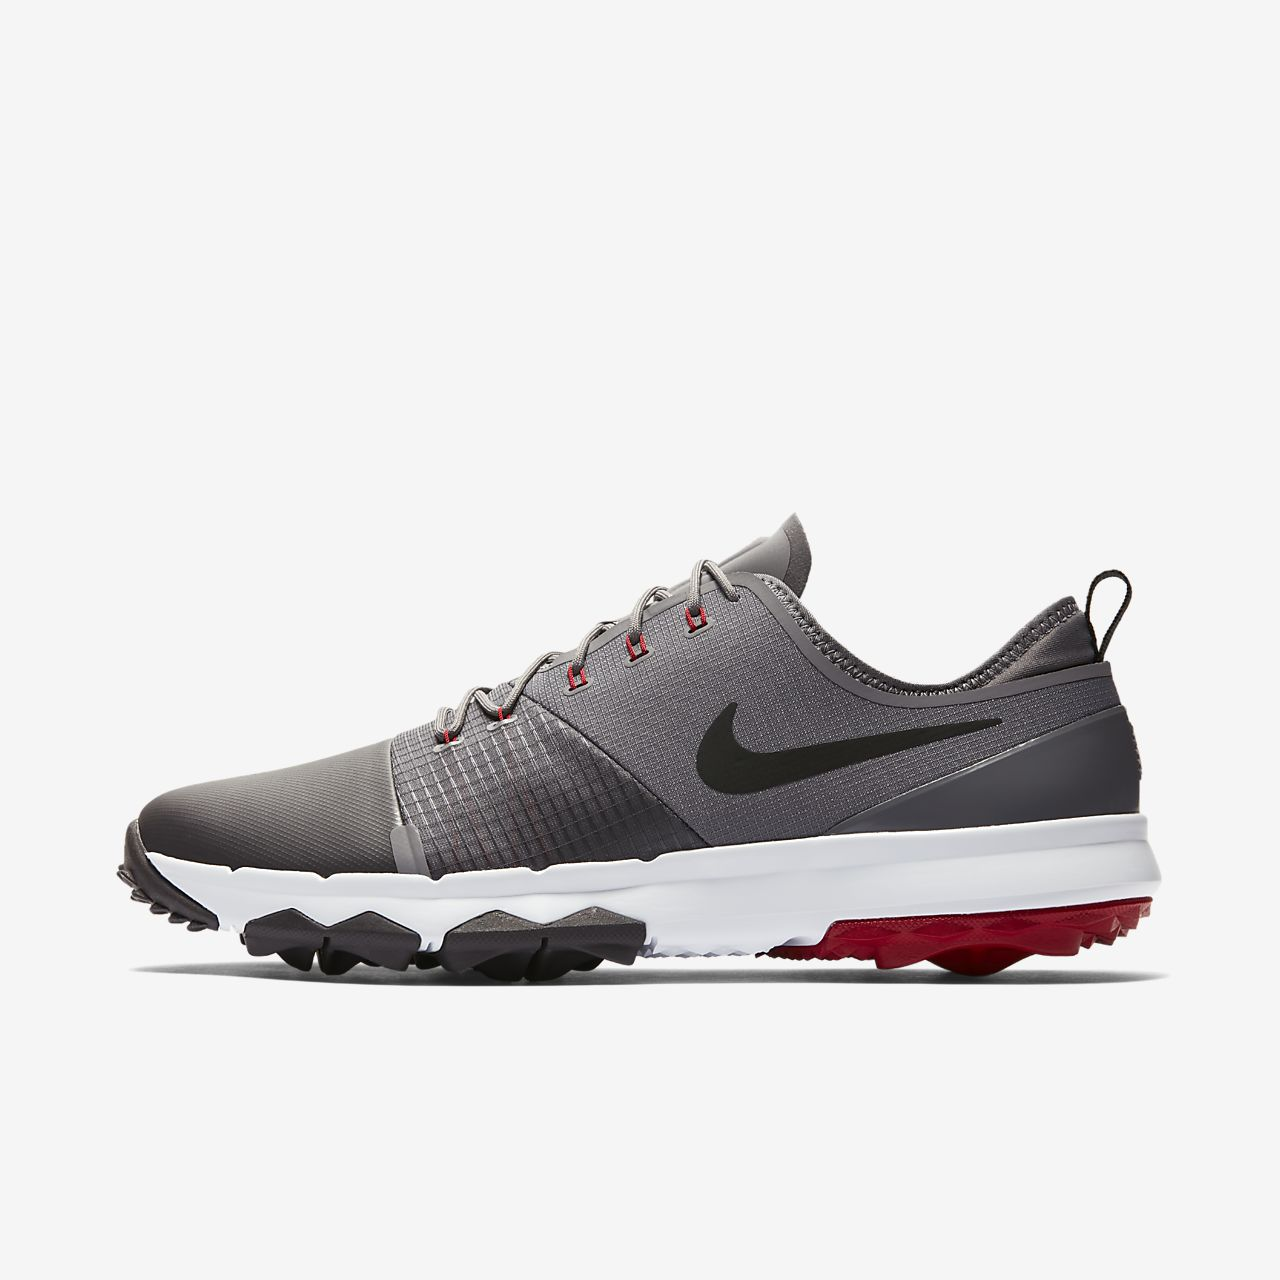 Scarpa da golf Nike FI Impact 3 - Uomo